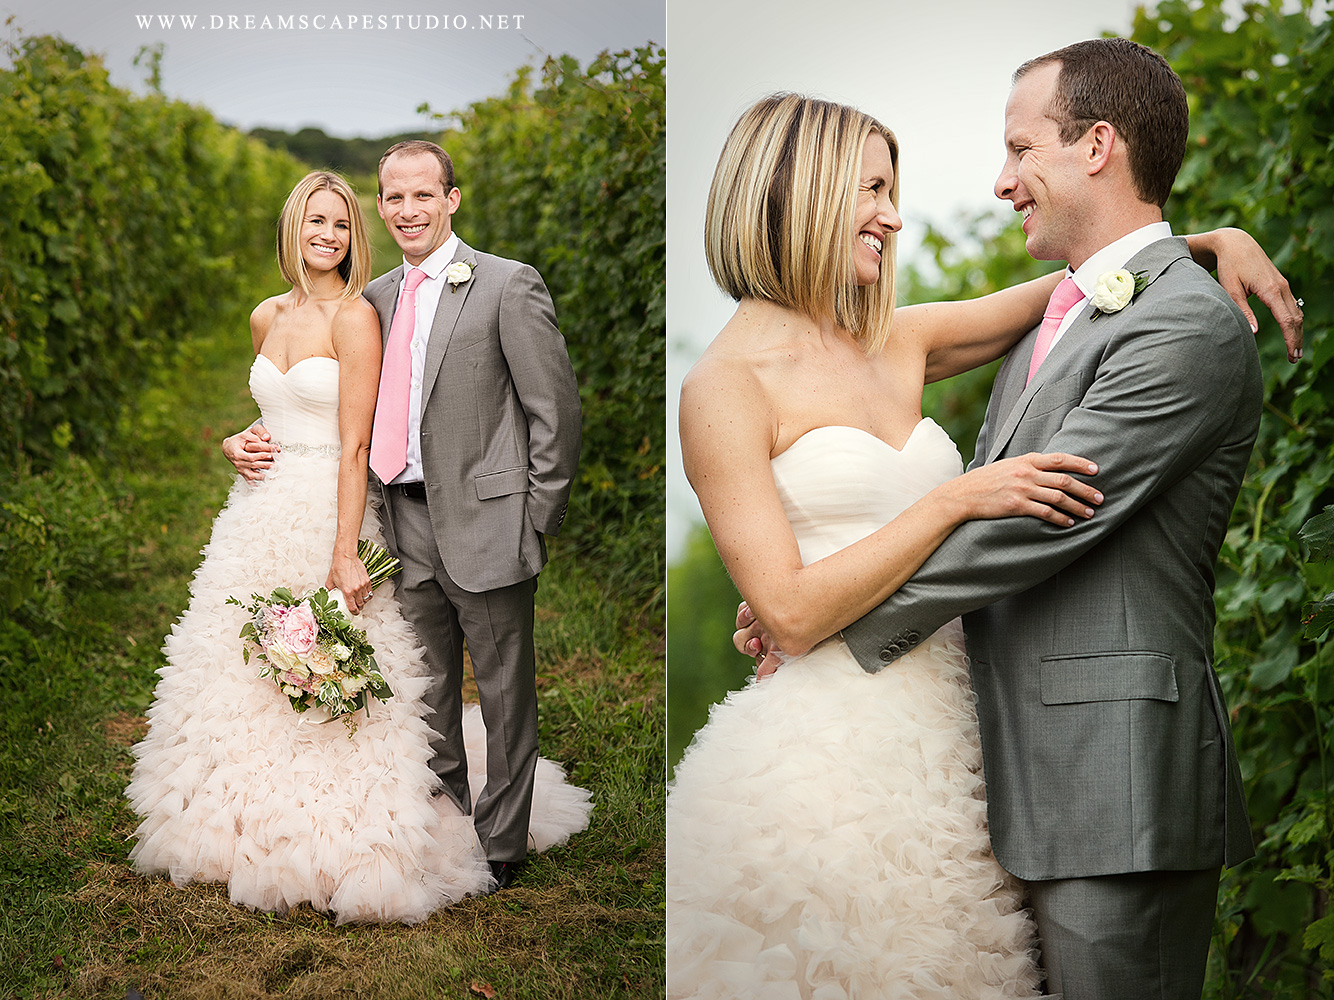 CT_Wedding_Photographer_ZBJi_Blg_16.jpg